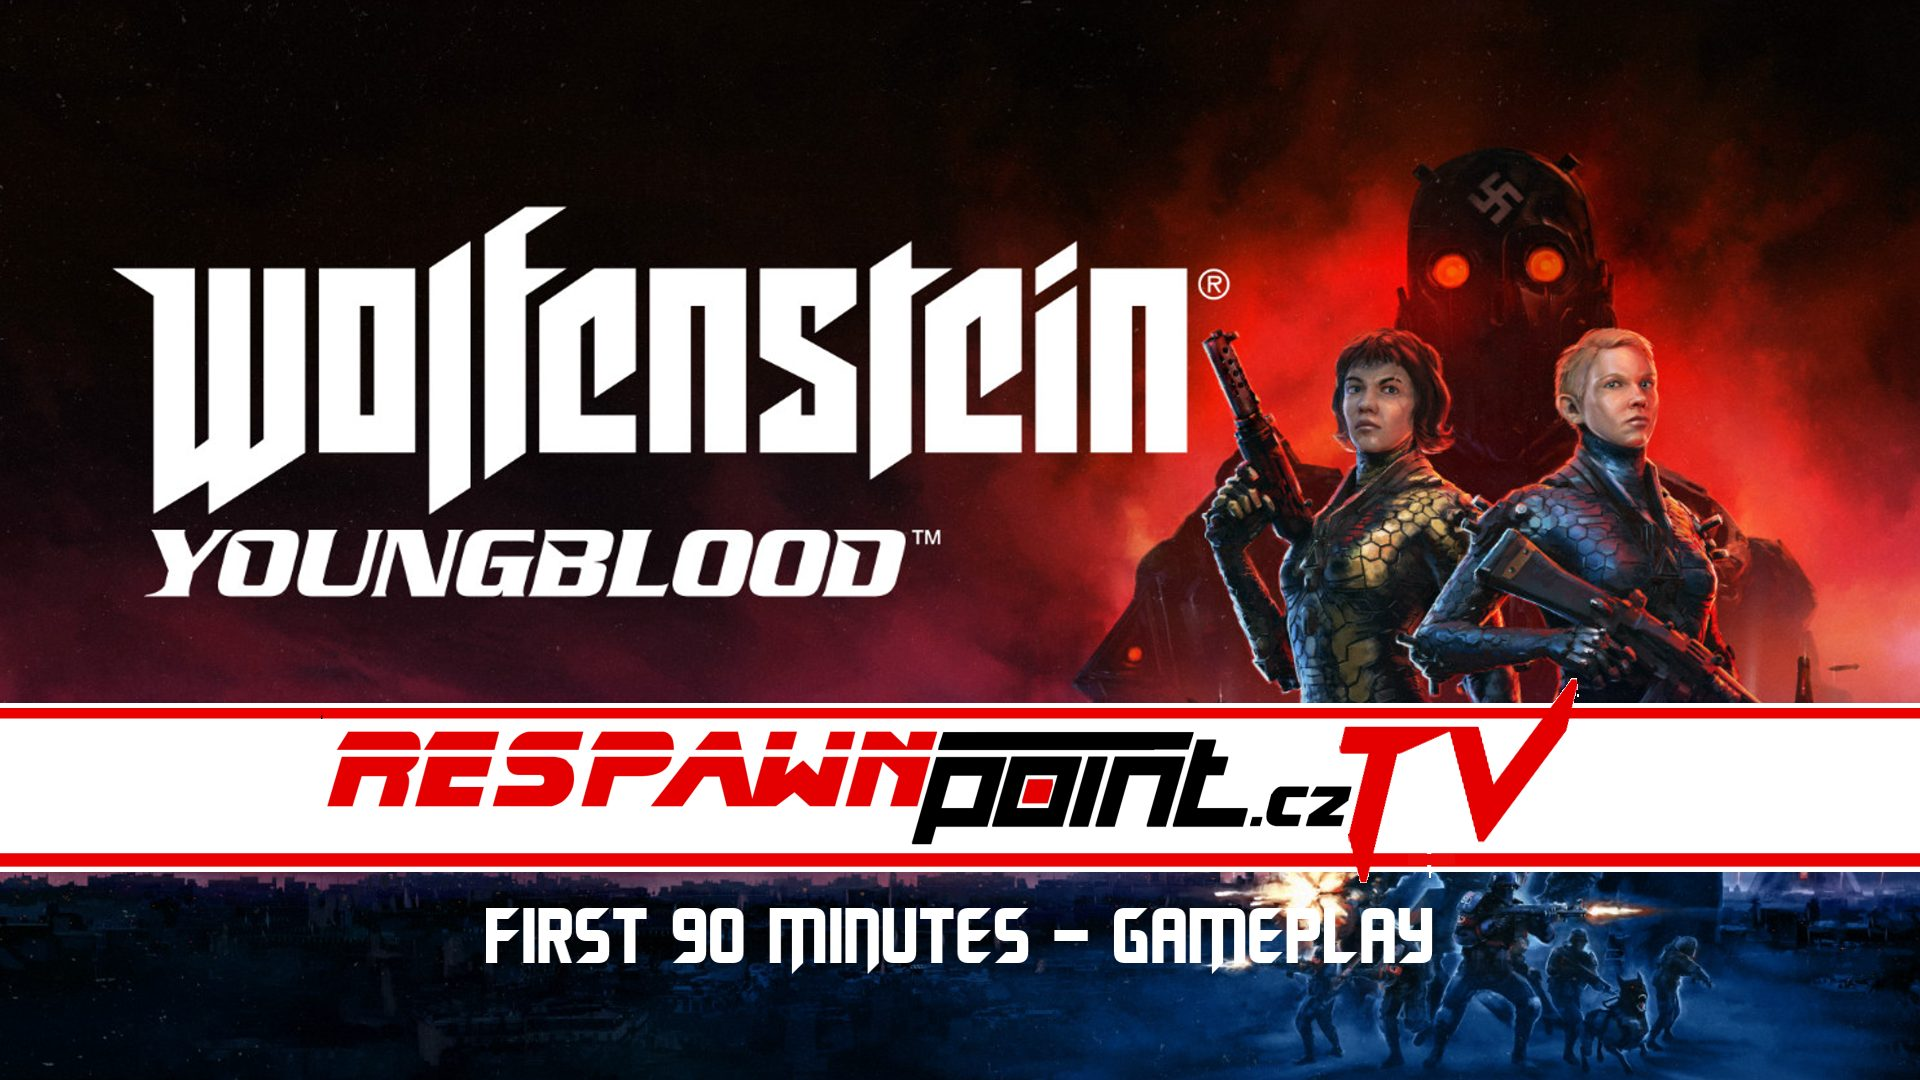 Wolfenstein Youngblood – Prvních 90 minut